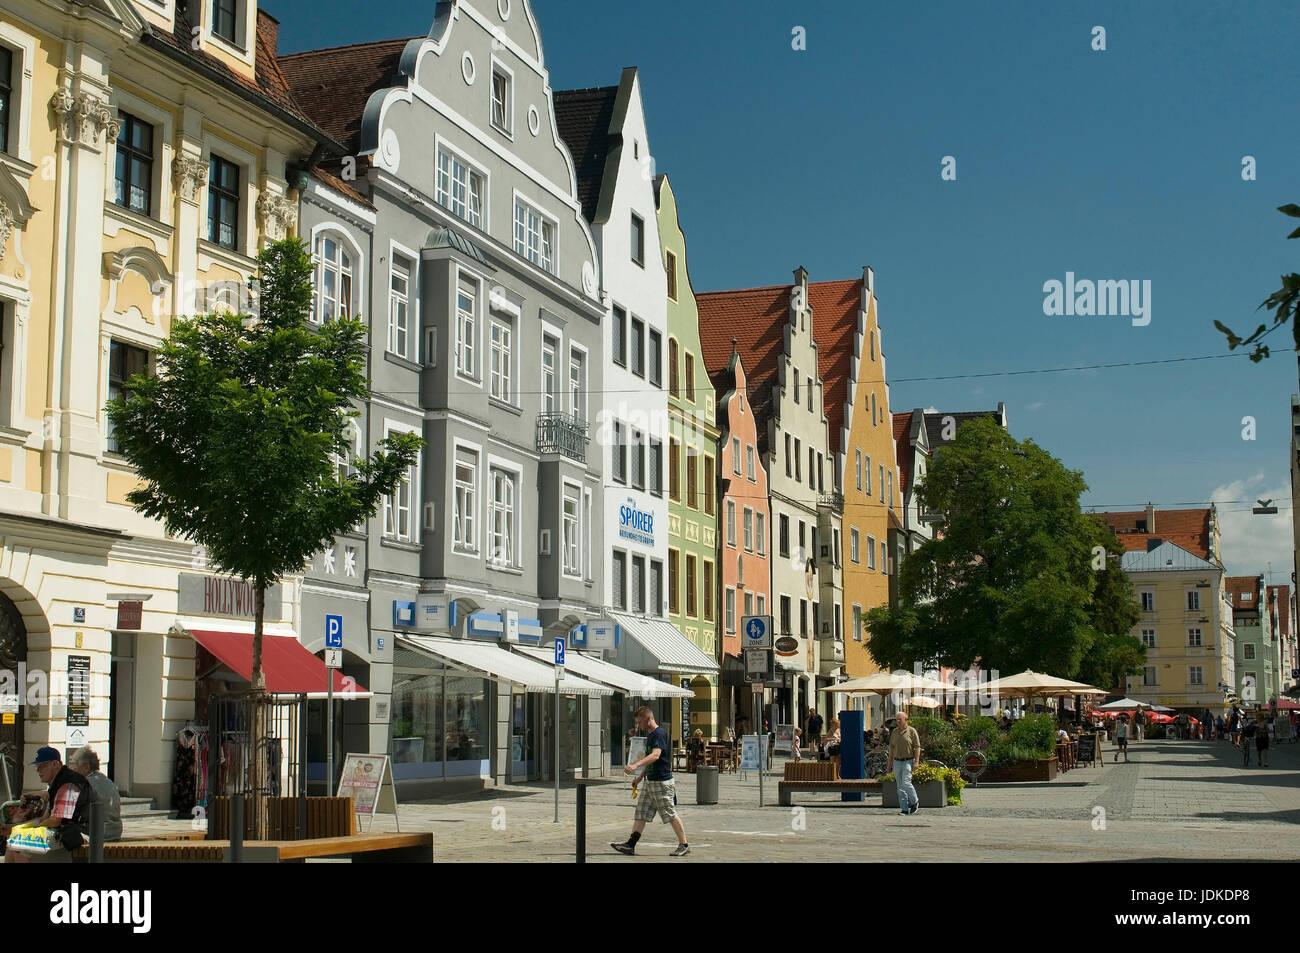 Europe, Germany, Bavaria, Ingolstadt, Theresienstrasse, , Europa, Deutschland, Bayern, Theresienstraße - Stock Image